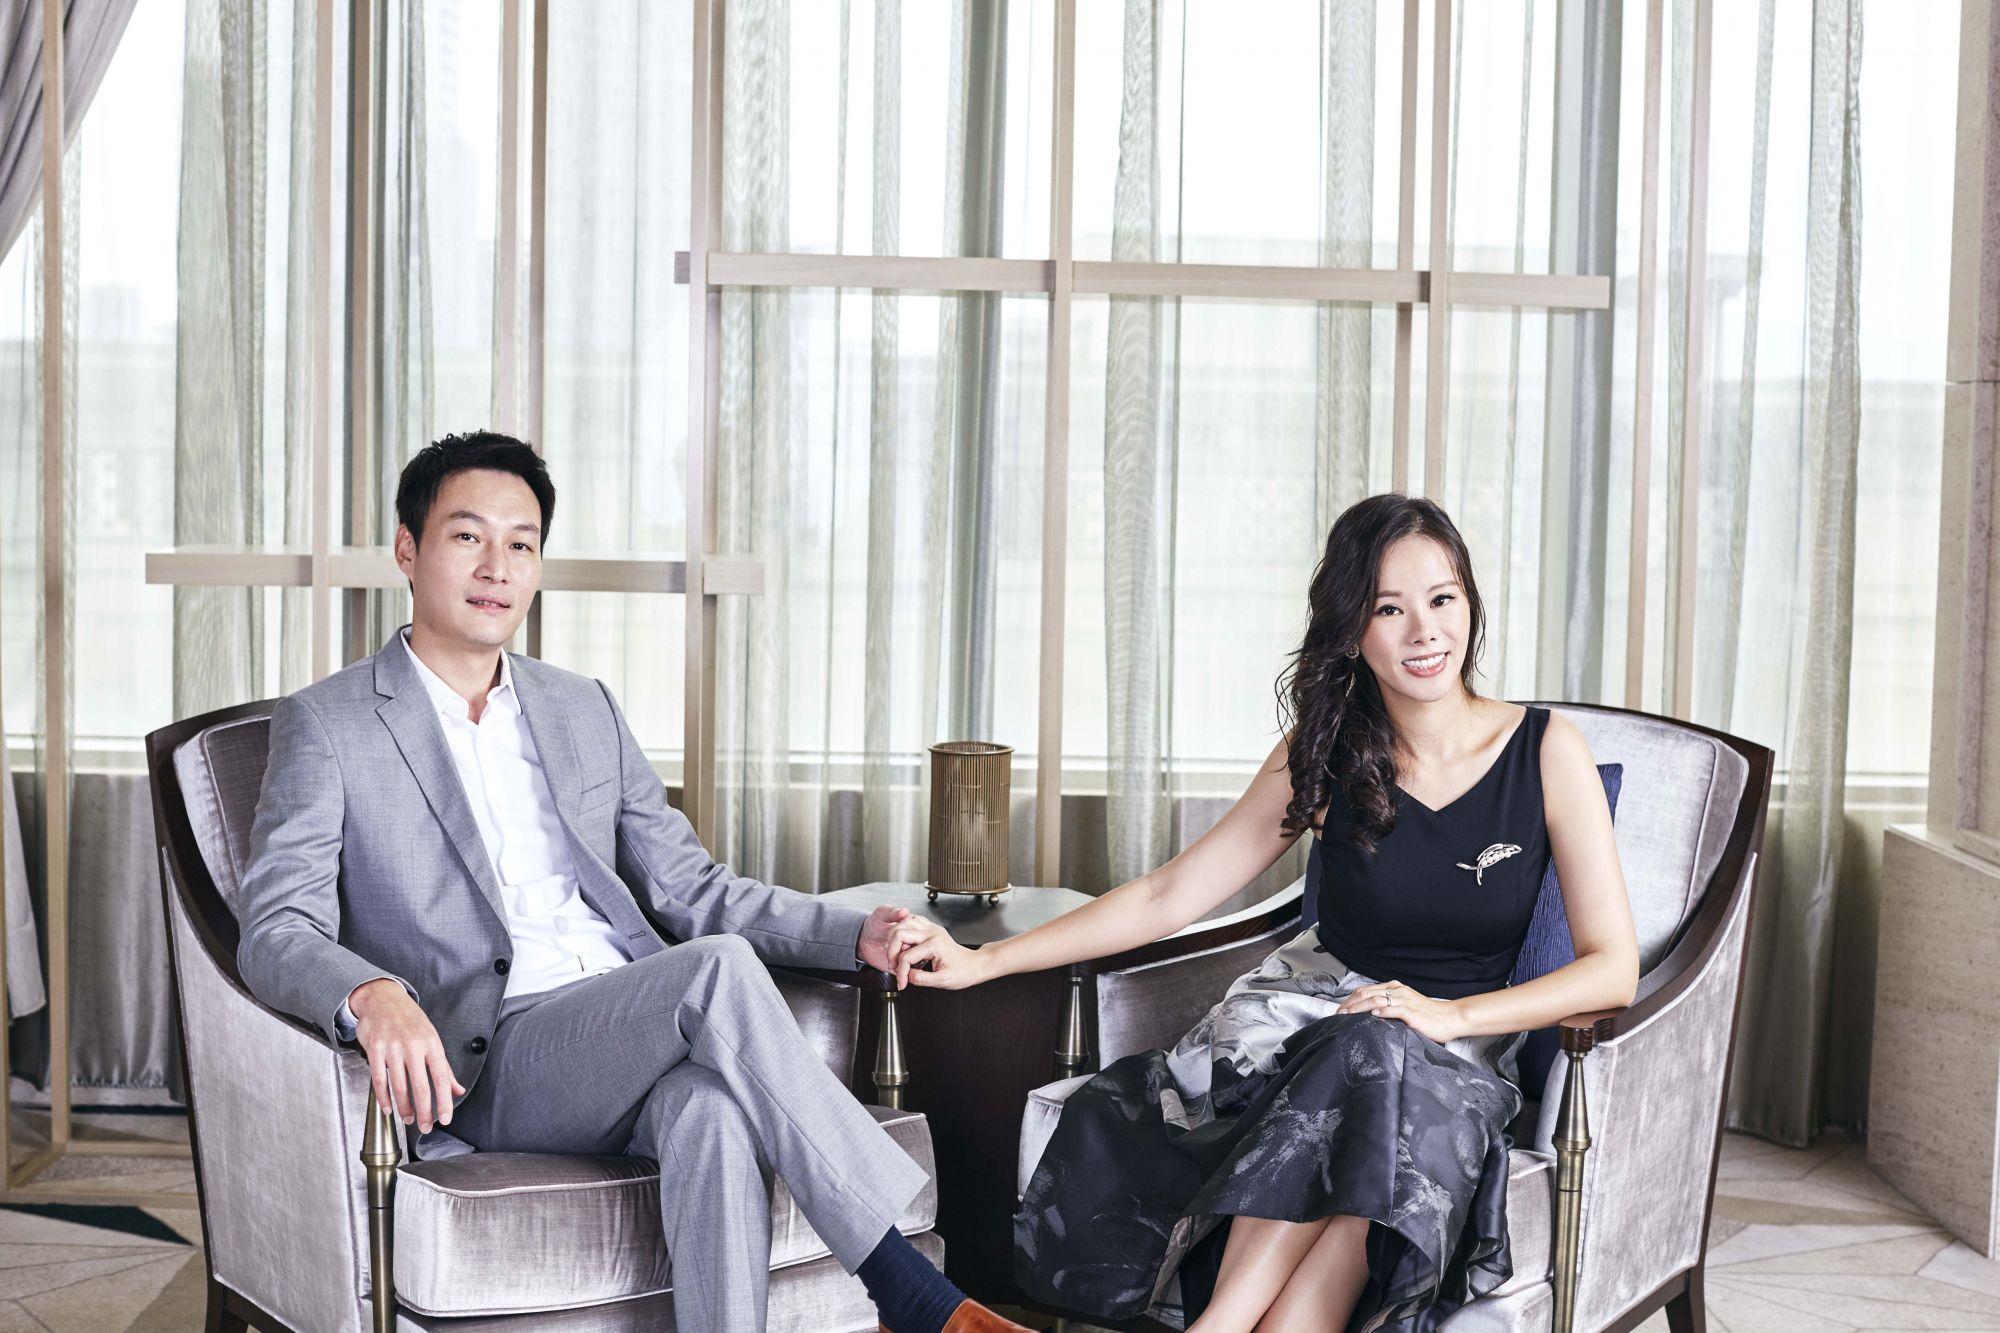 Taiwan Tatler Award 2018年度璀璨魅力伉儷獎得主:川菱工業股份有限公司董事長陳逸霖、陳孟妮伉儷